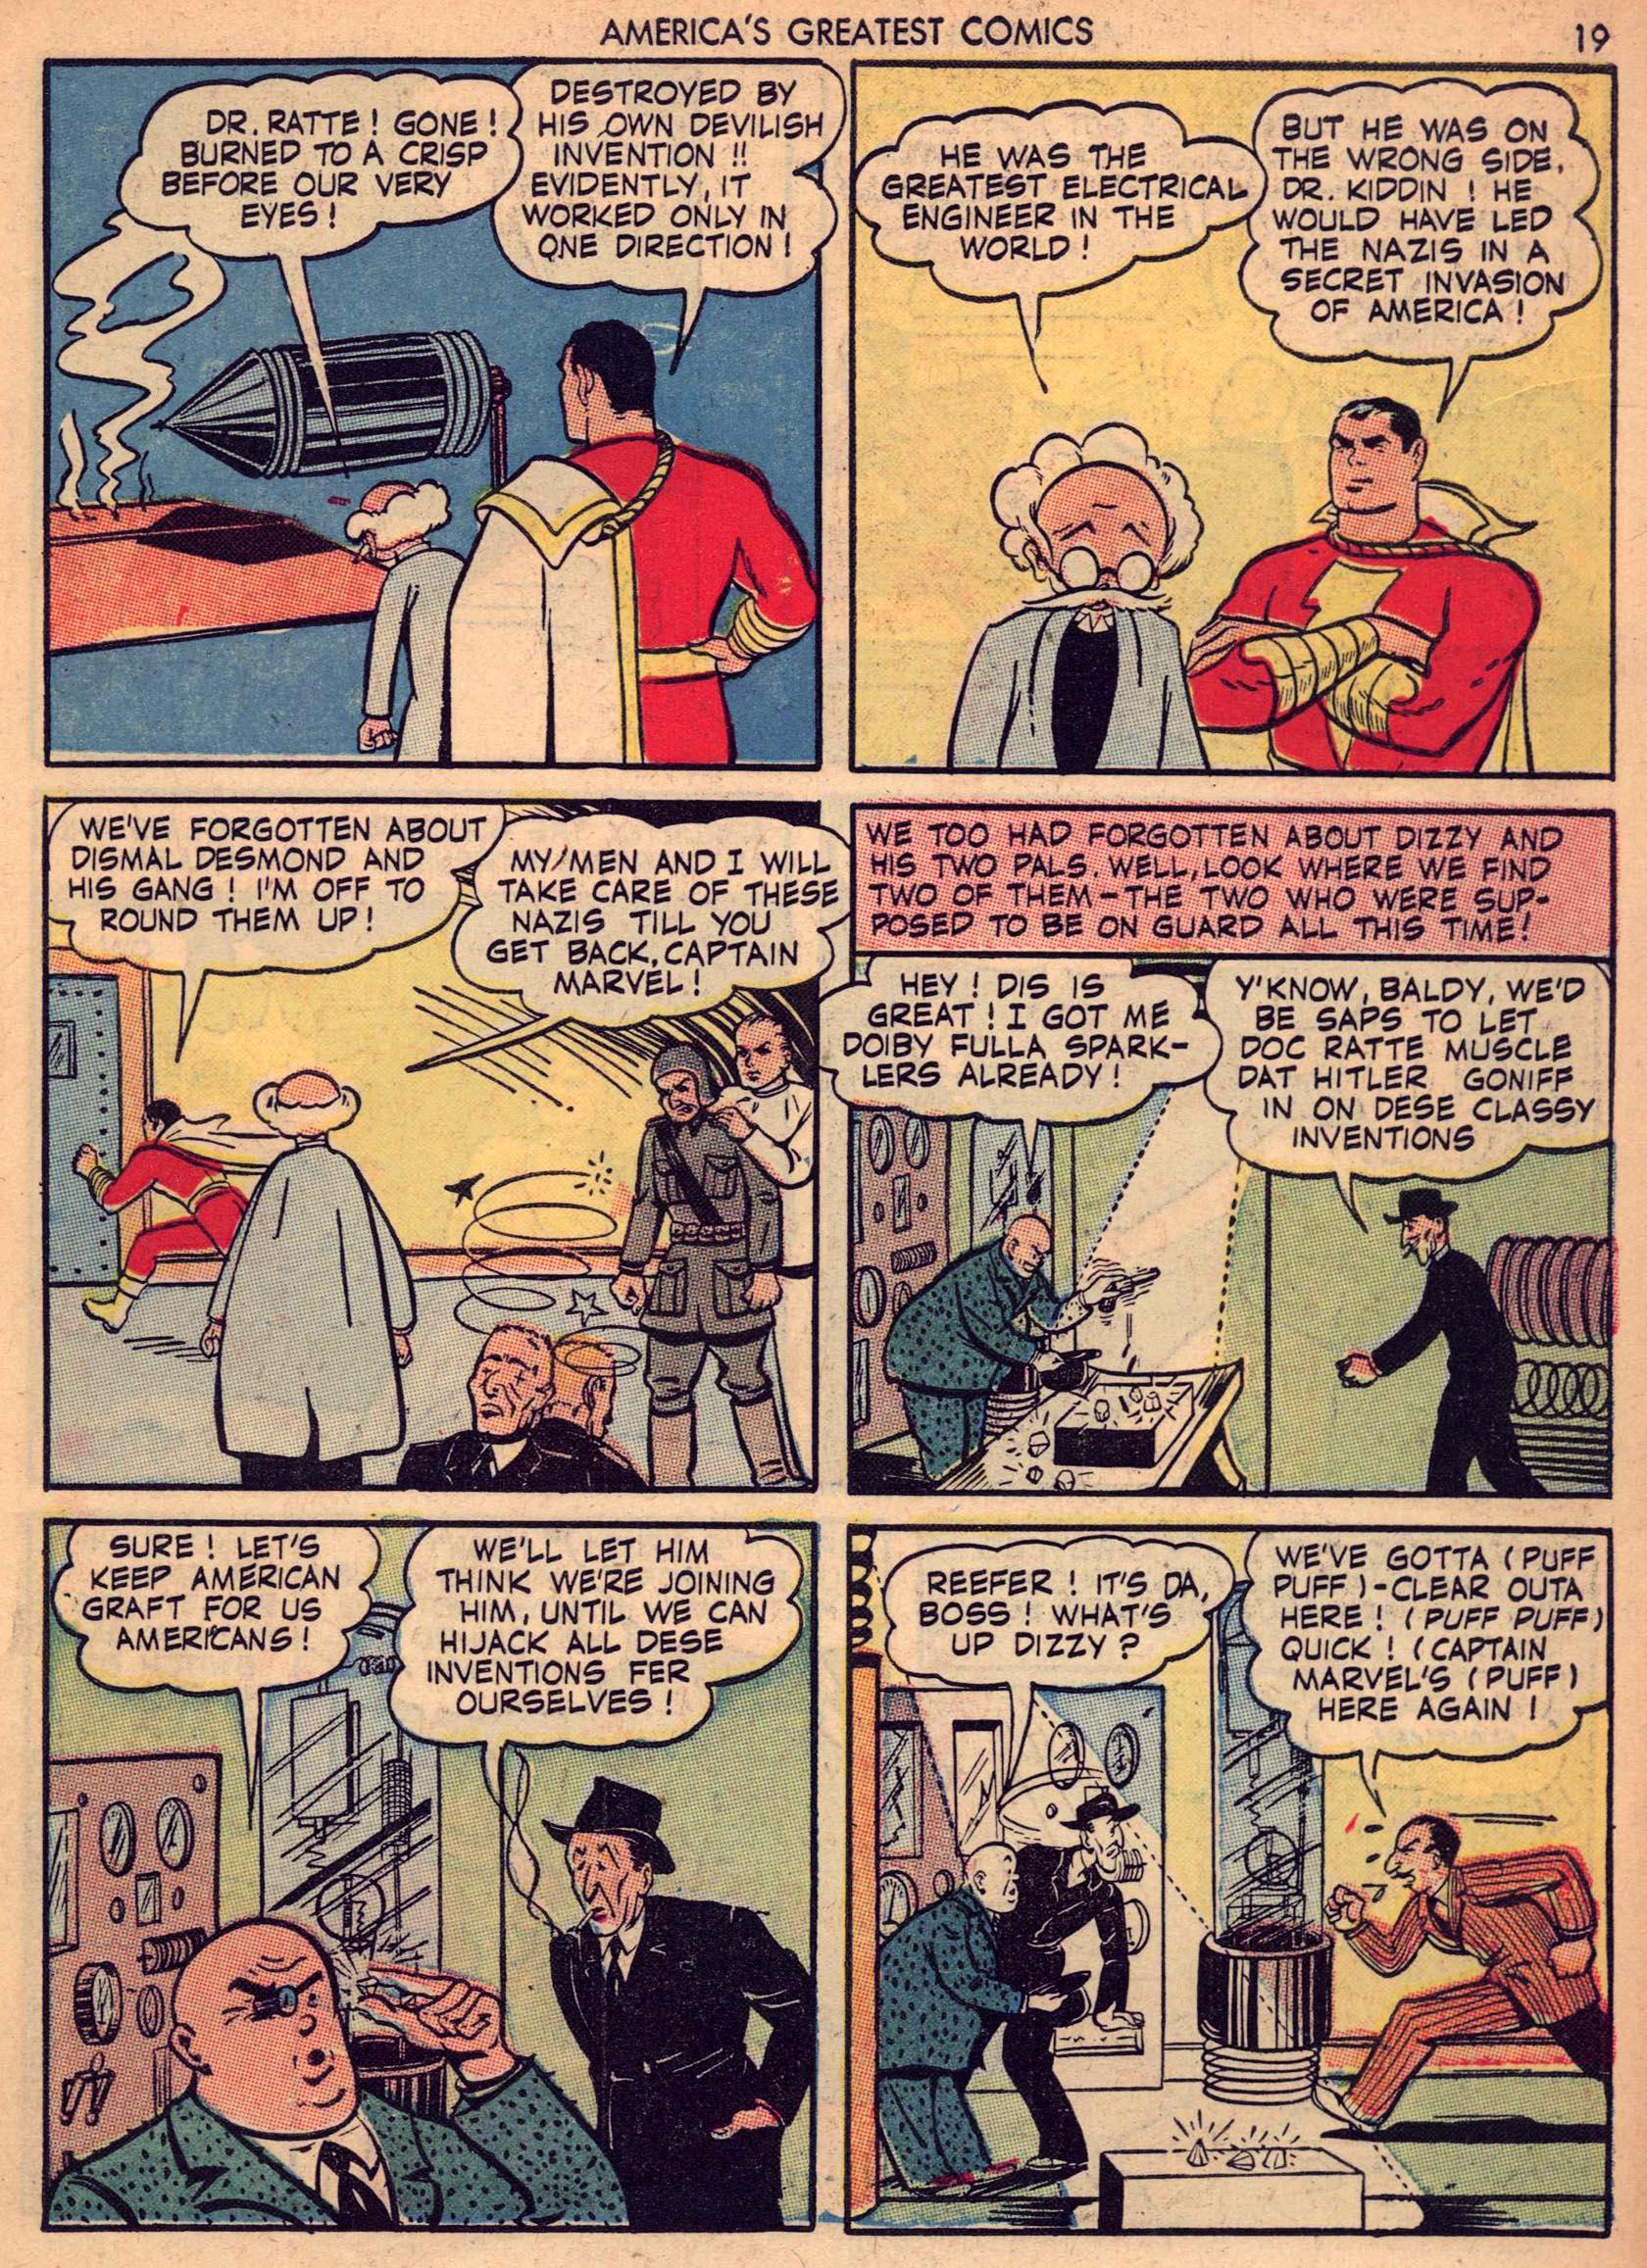 Read online America's Greatest Comics comic -  Issue #7 - 18